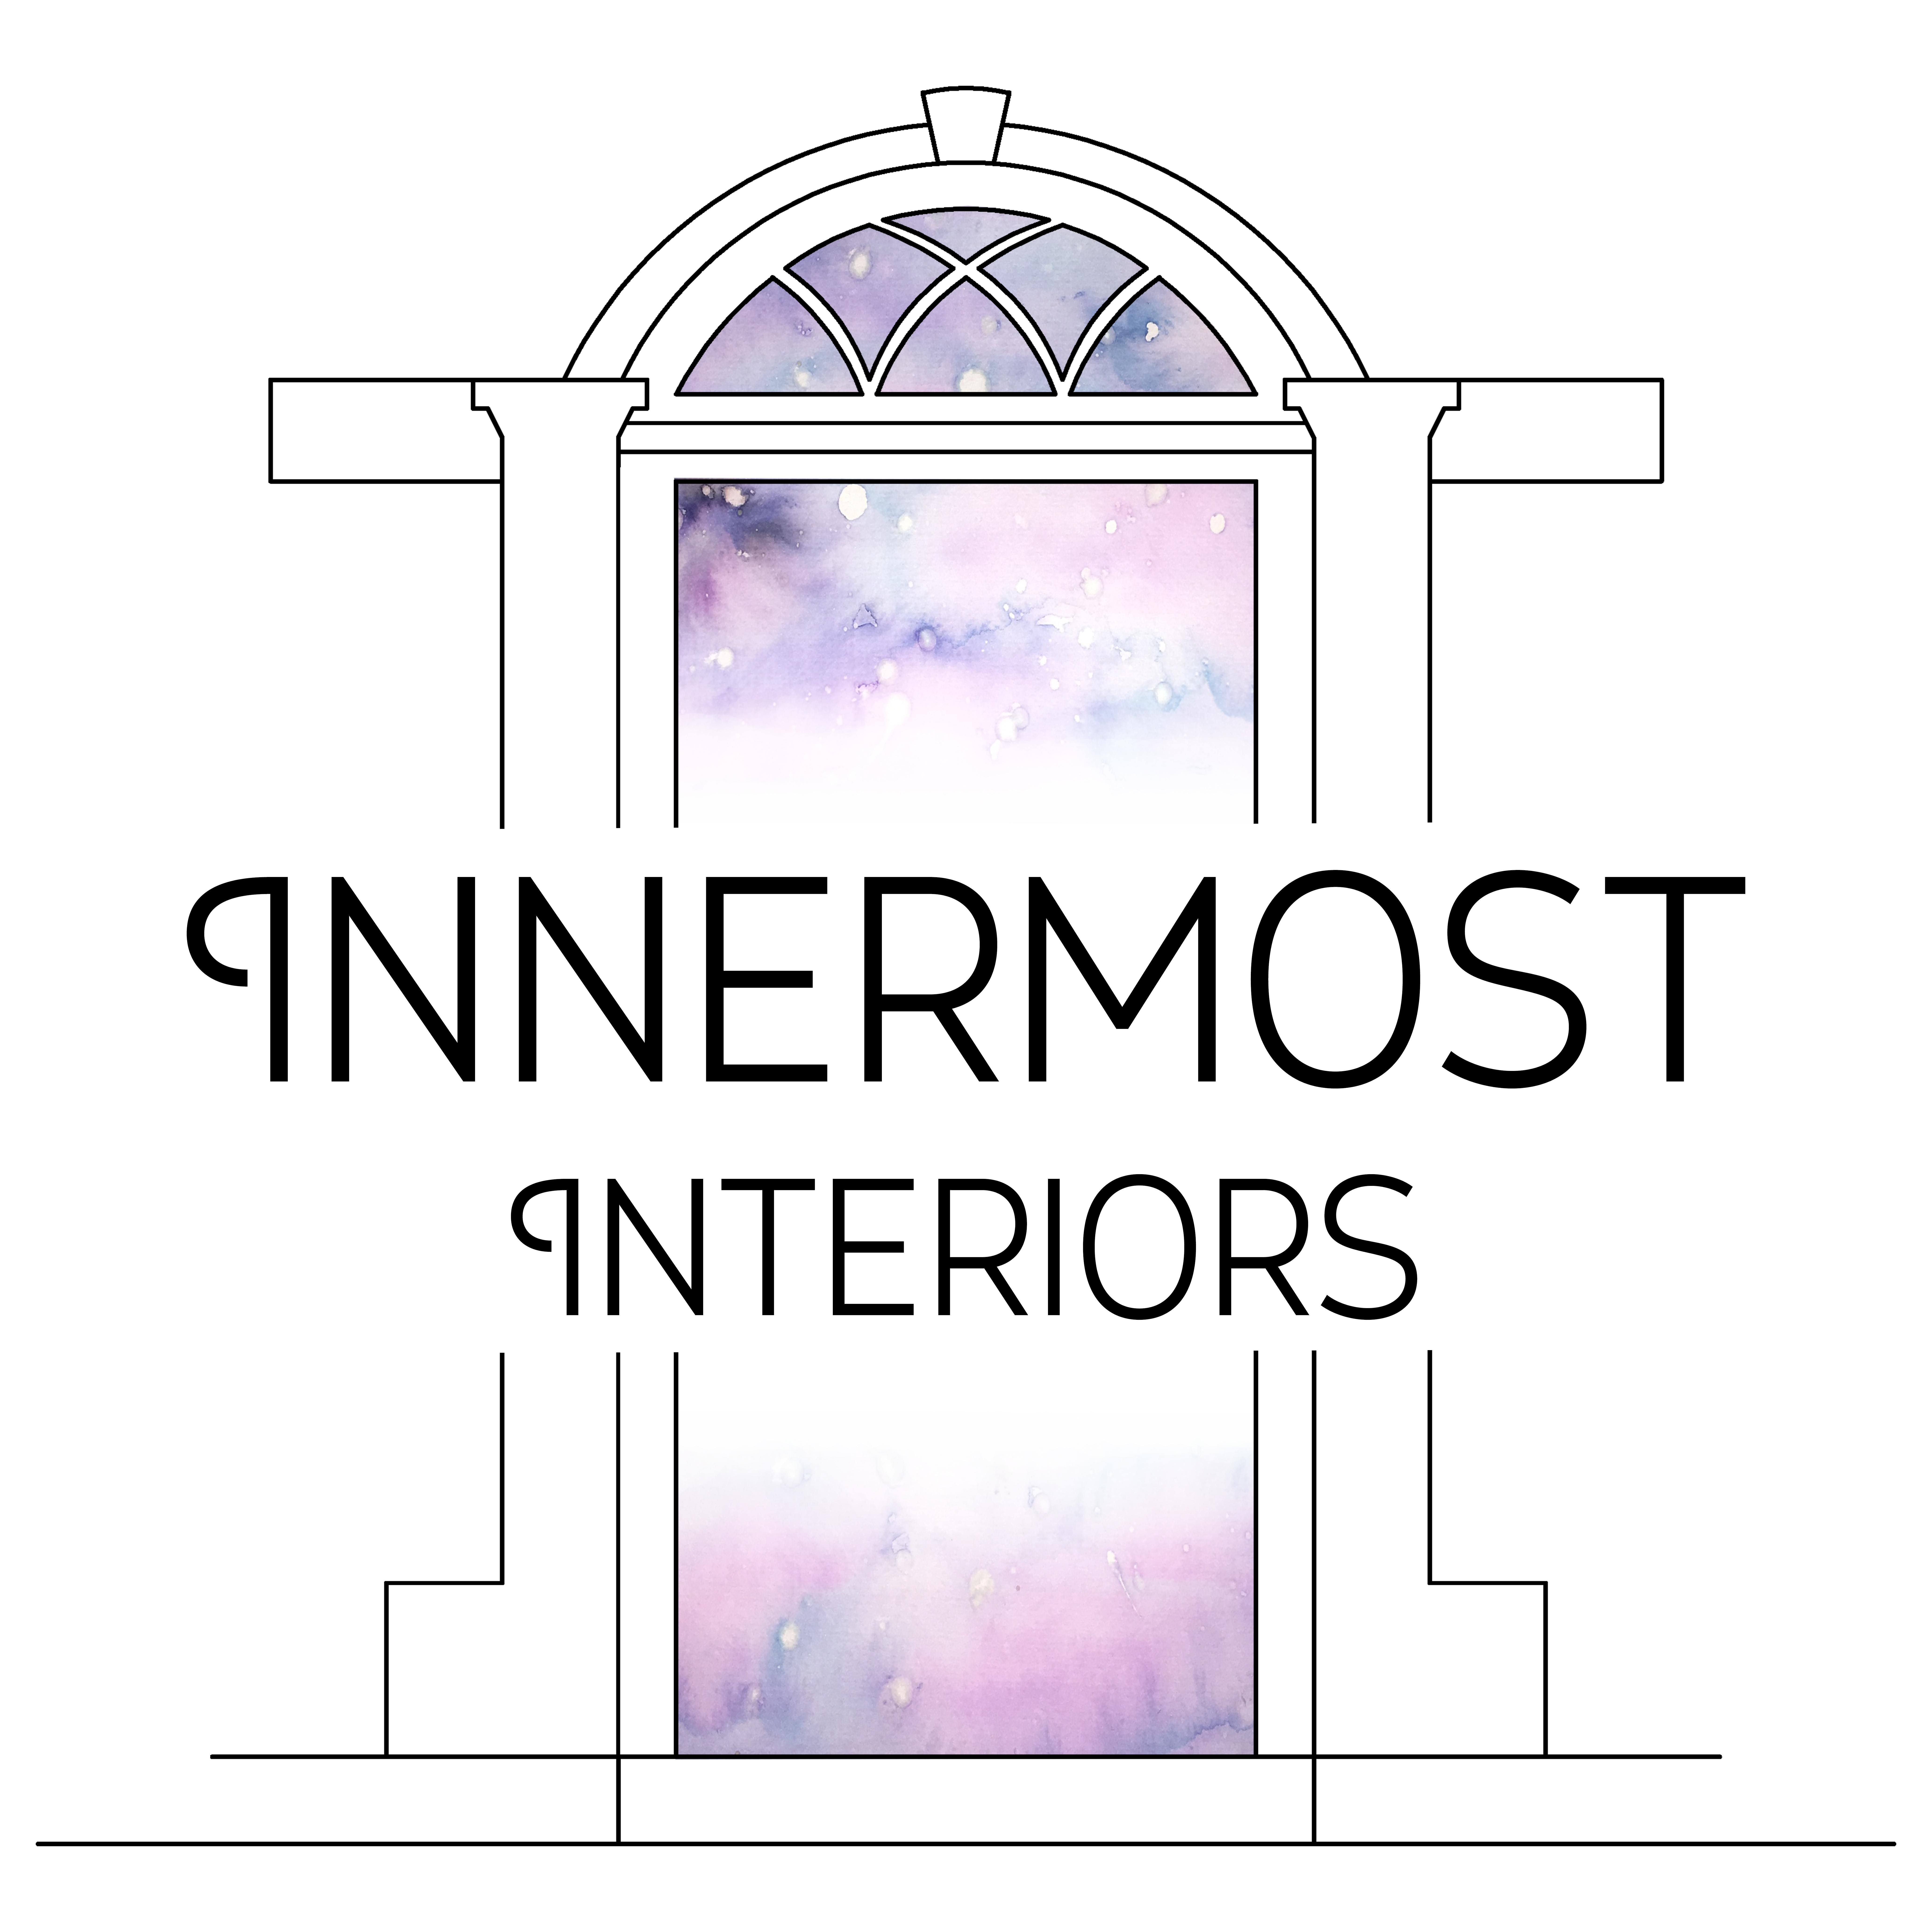 Innermost Interiors